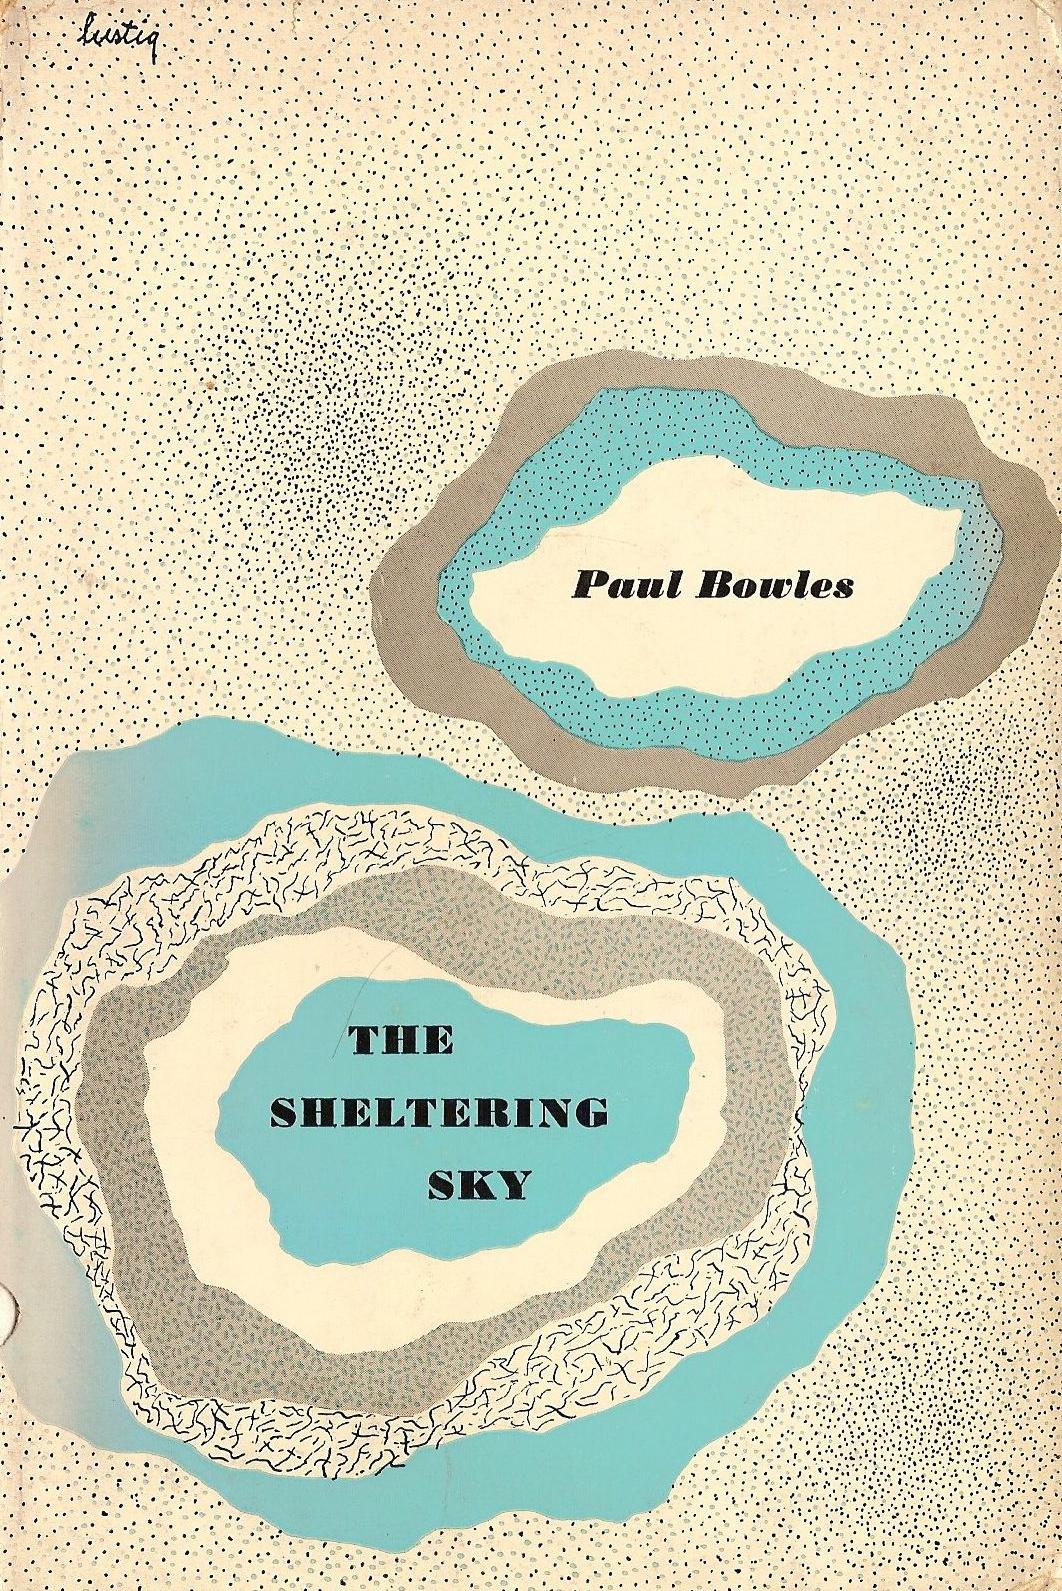 The Sheltering Sky via